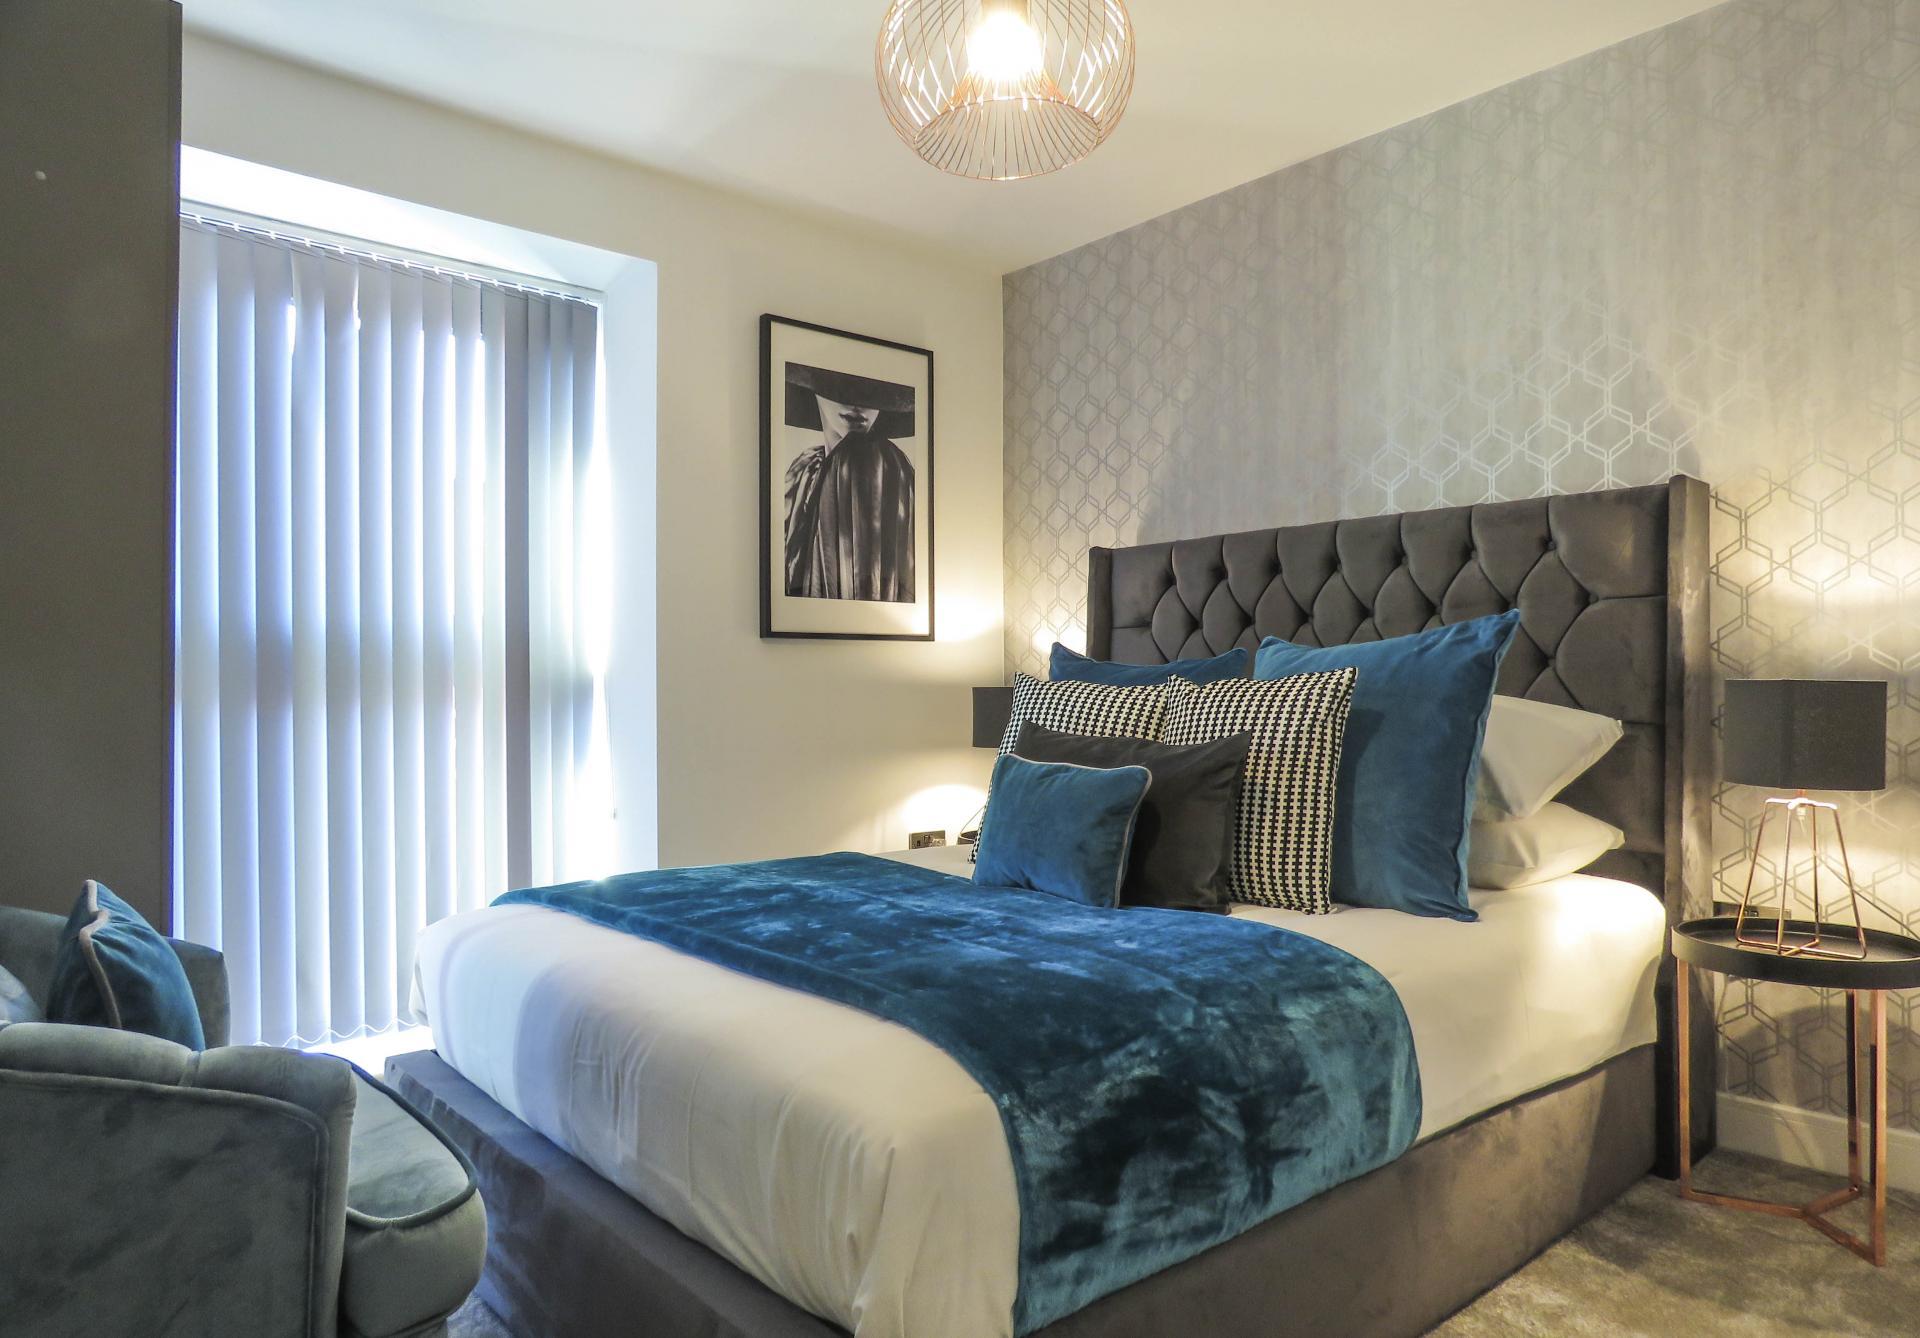 Bedroom at Kettleworks Serviced Apartments